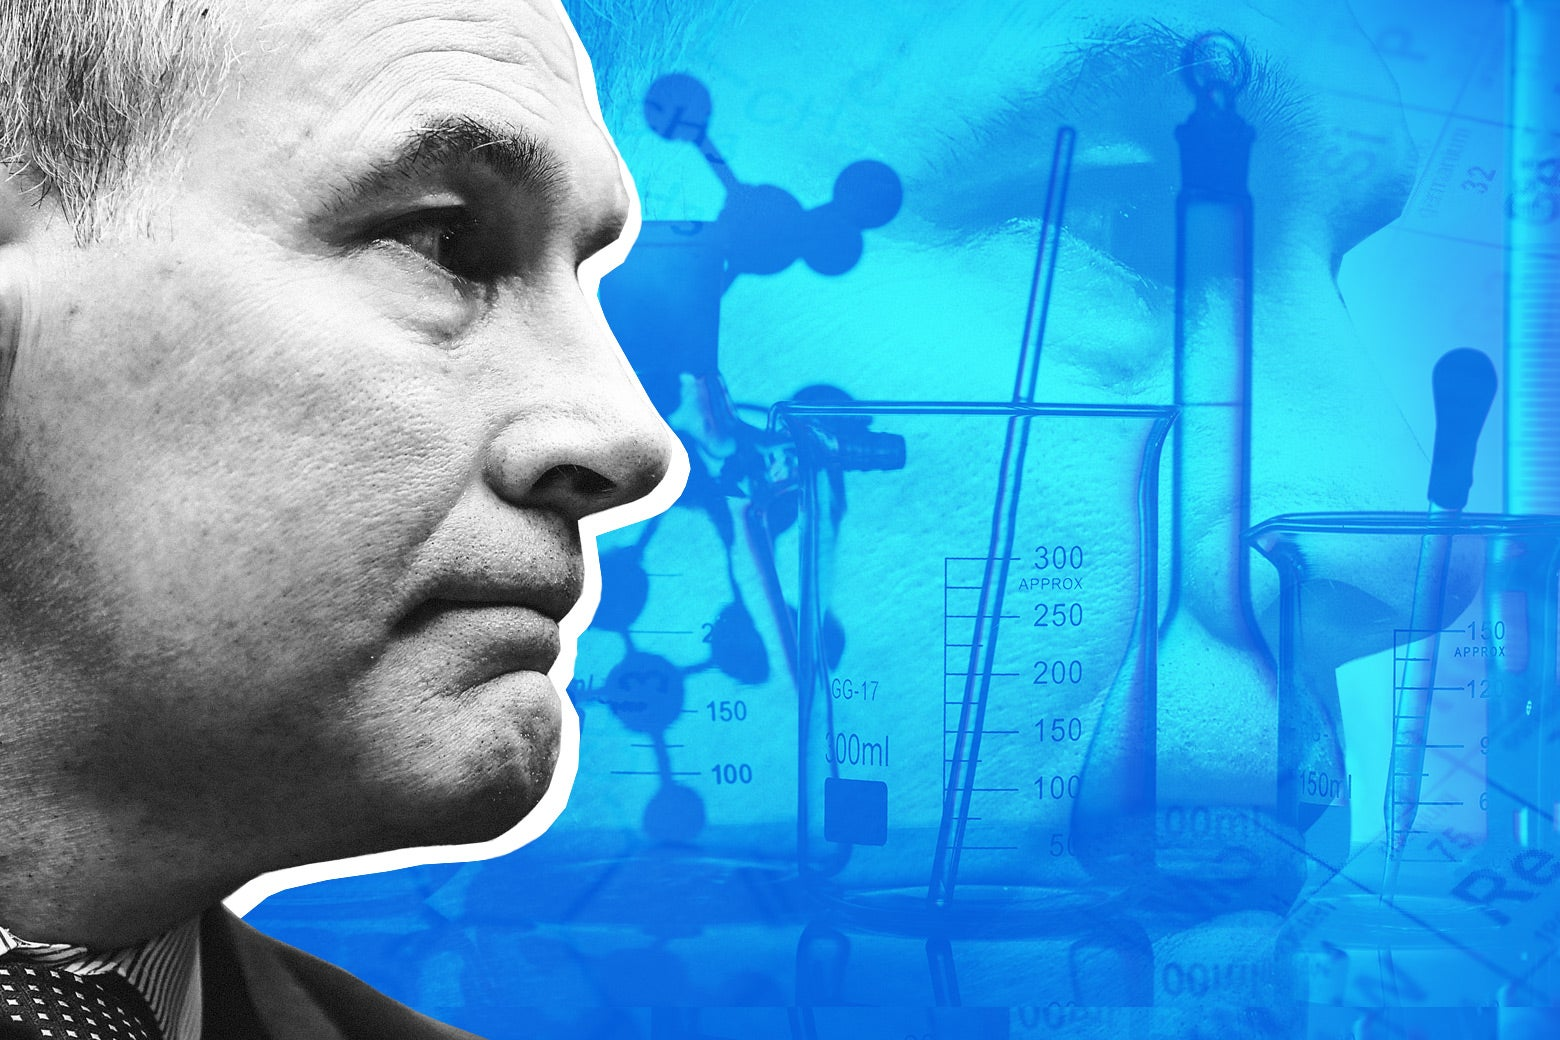 Scott Pruitt and science instruments.